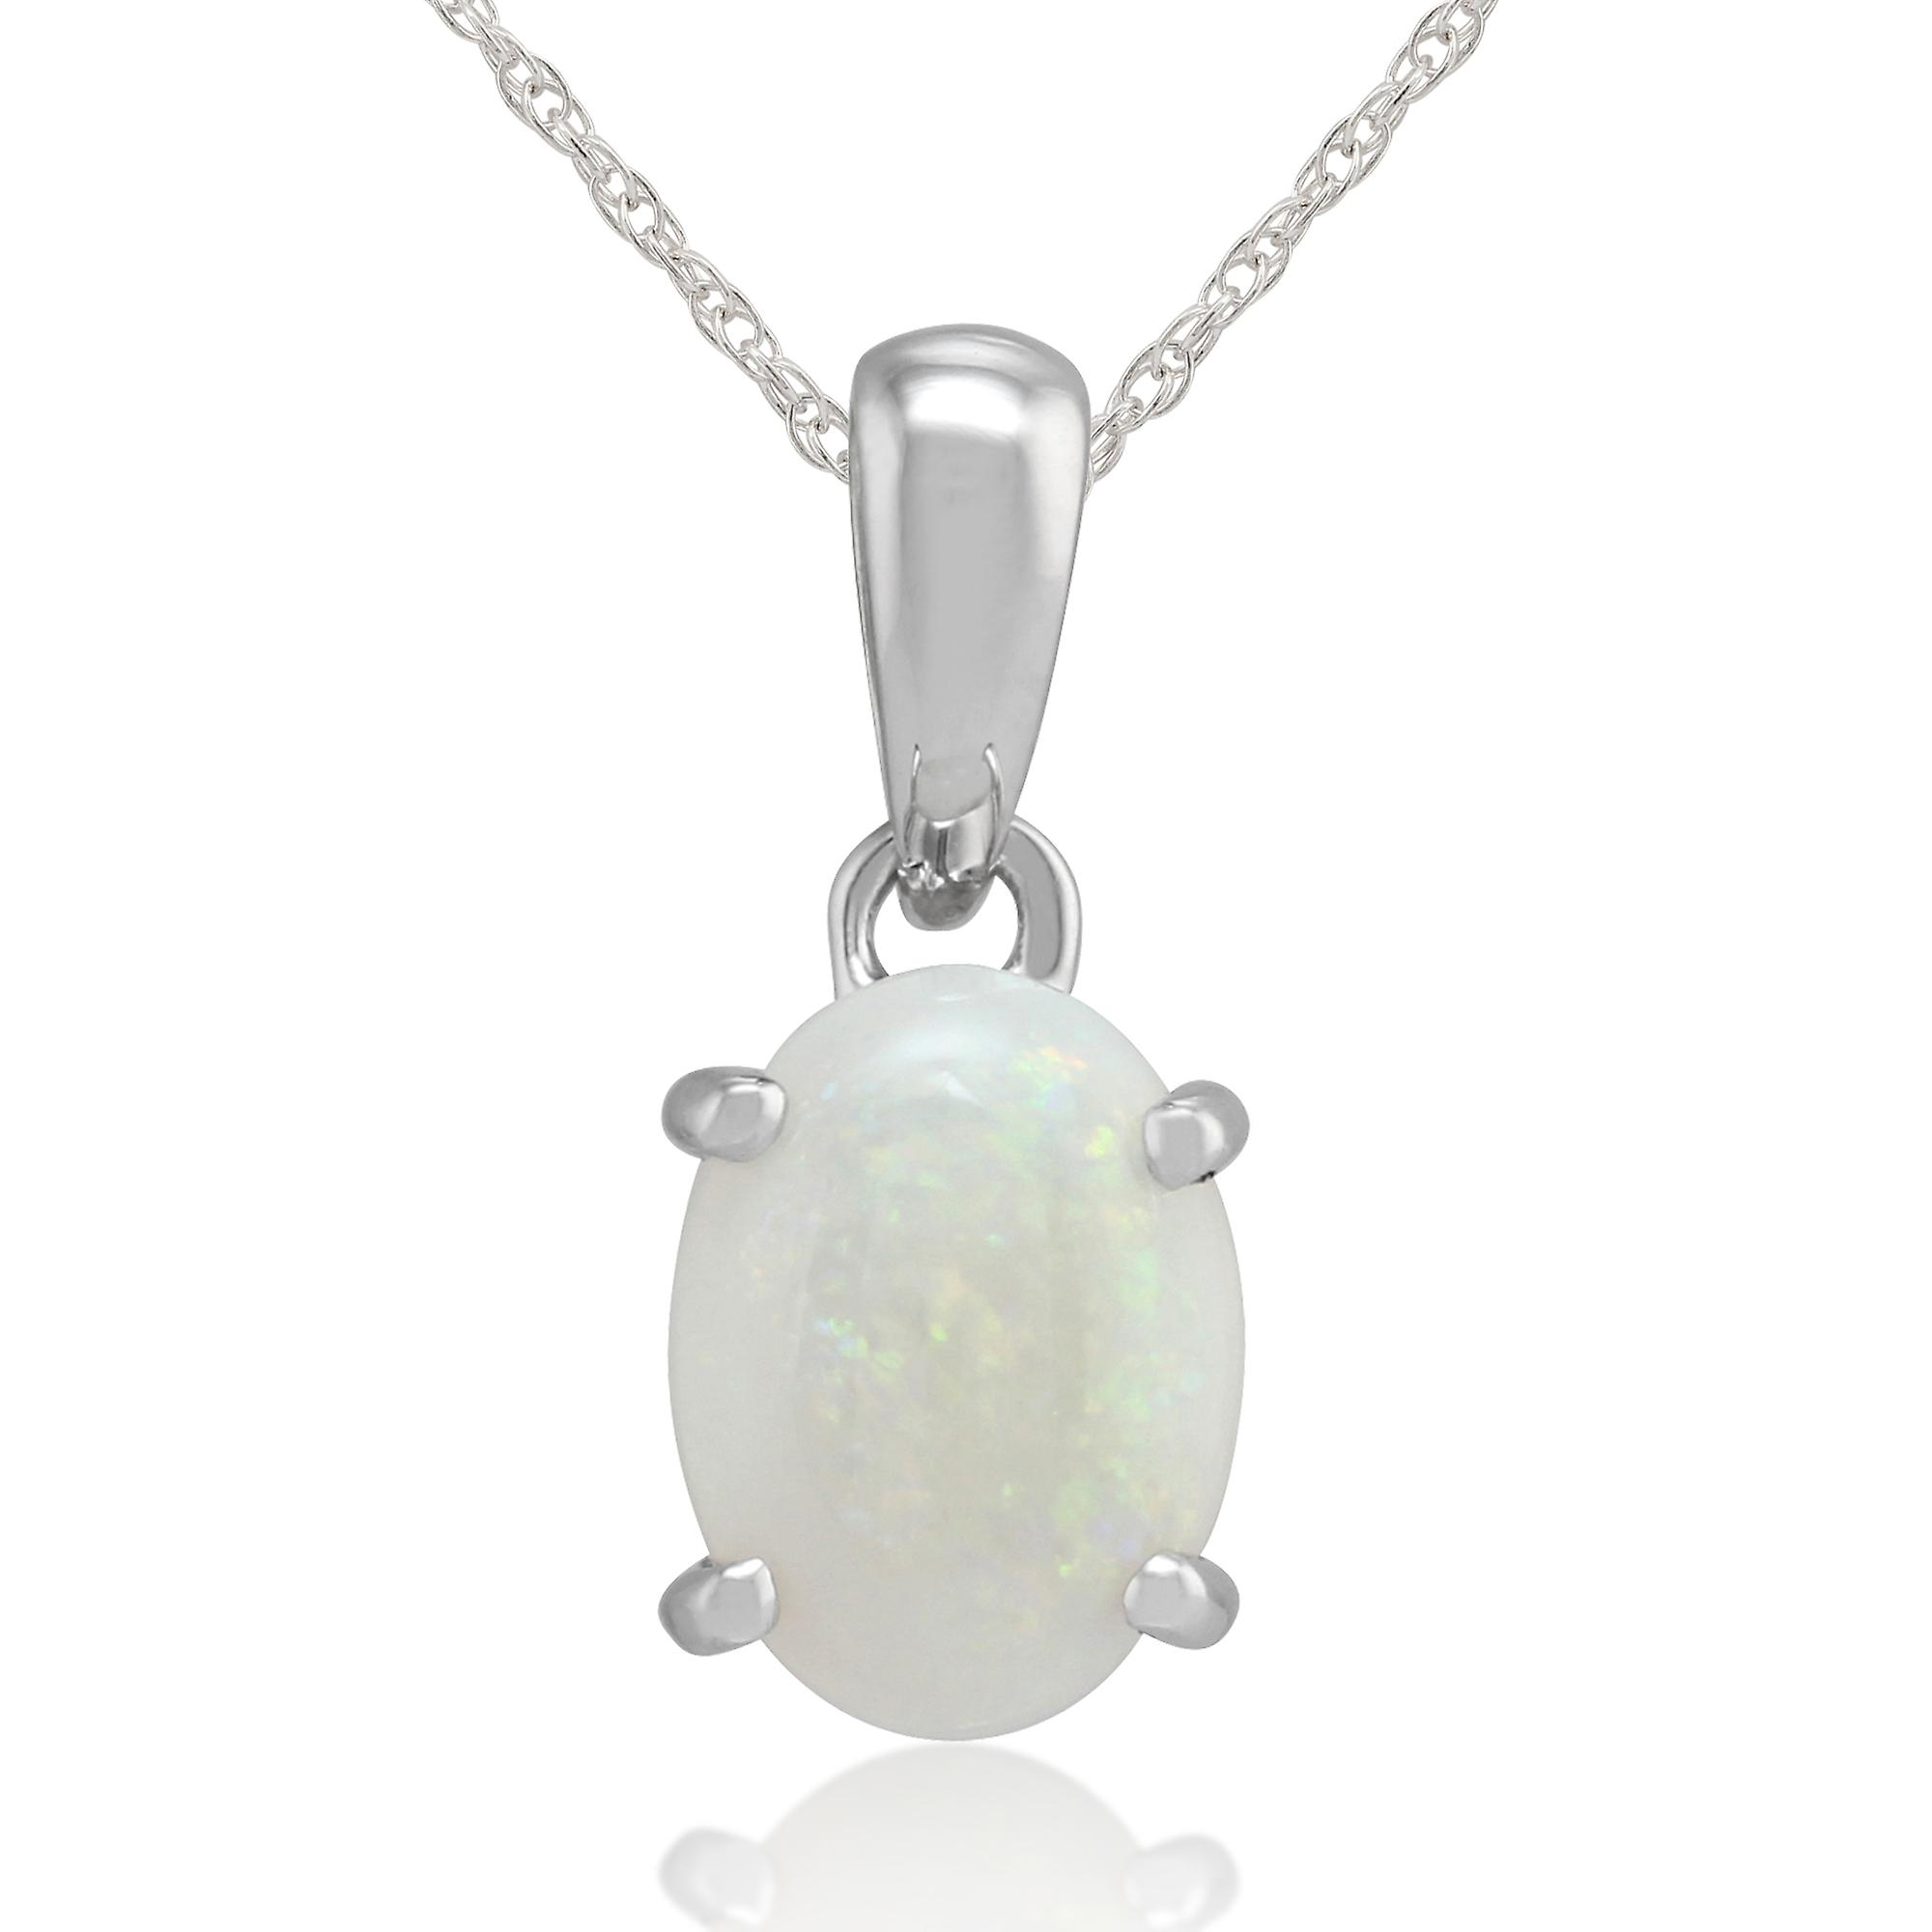 9ct White Gold 0.69ct Opal Cabochon Single Stone Pendant on 45cm Chain